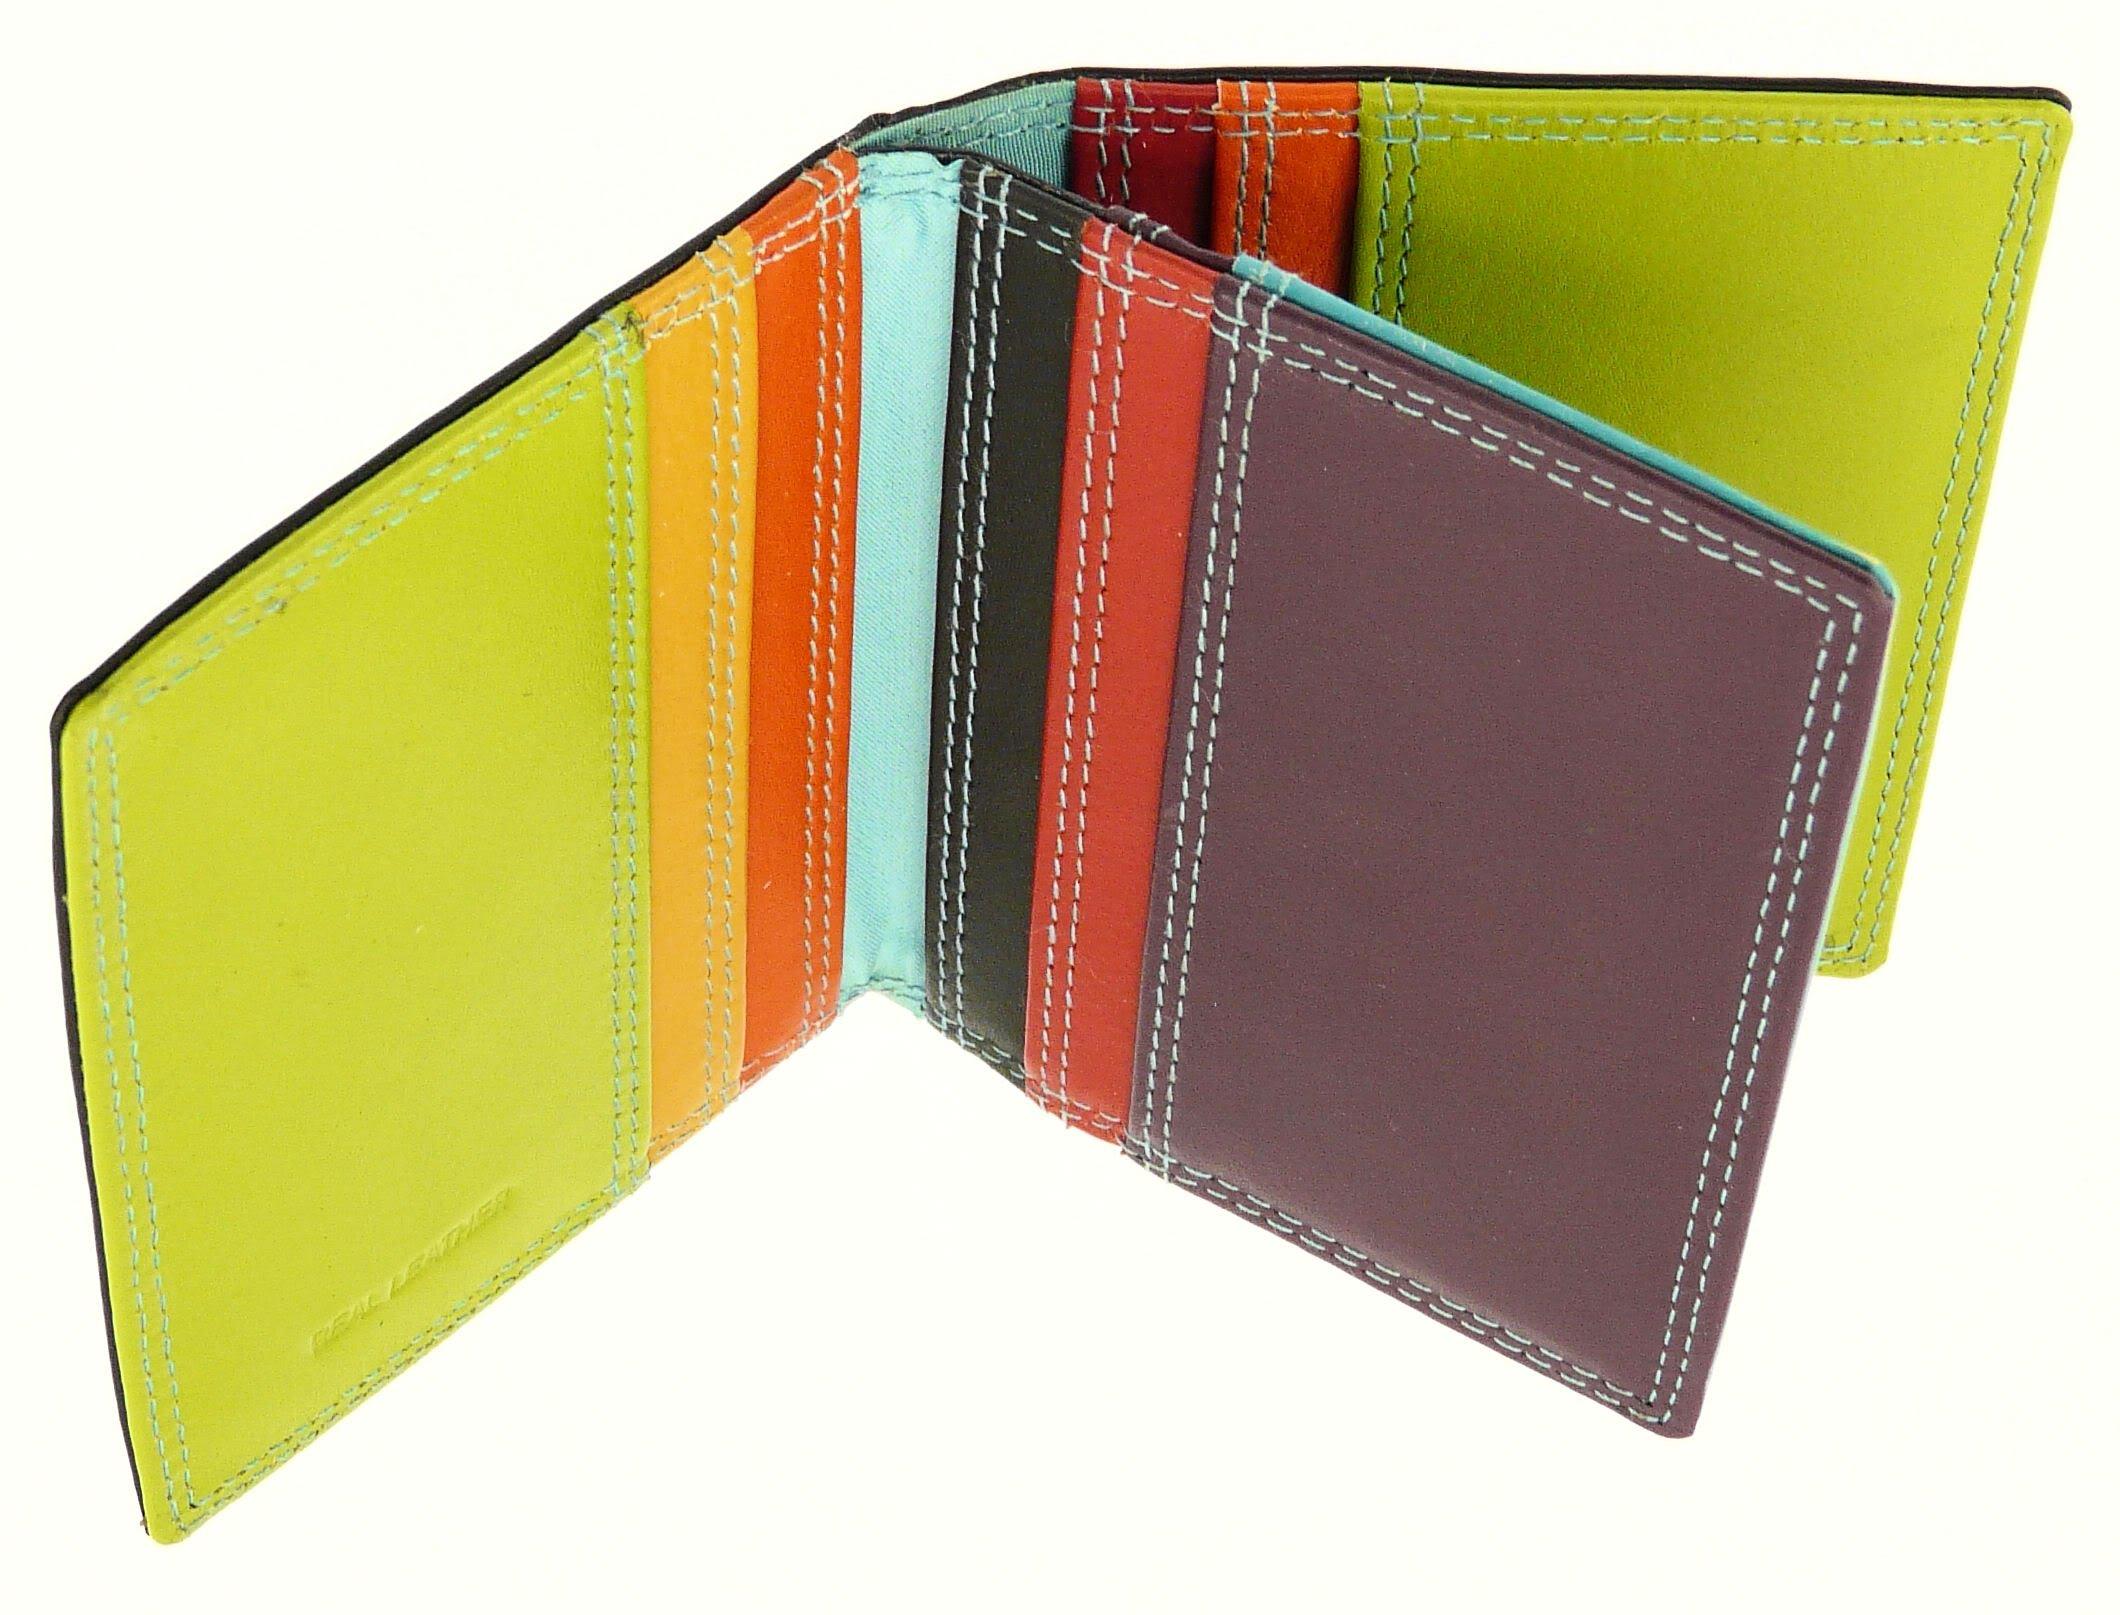 Black & Multi-color Leather Credit Card Holder / Wallet - Holds 10 Credit Cards by Neptune Giftware (Image #2)